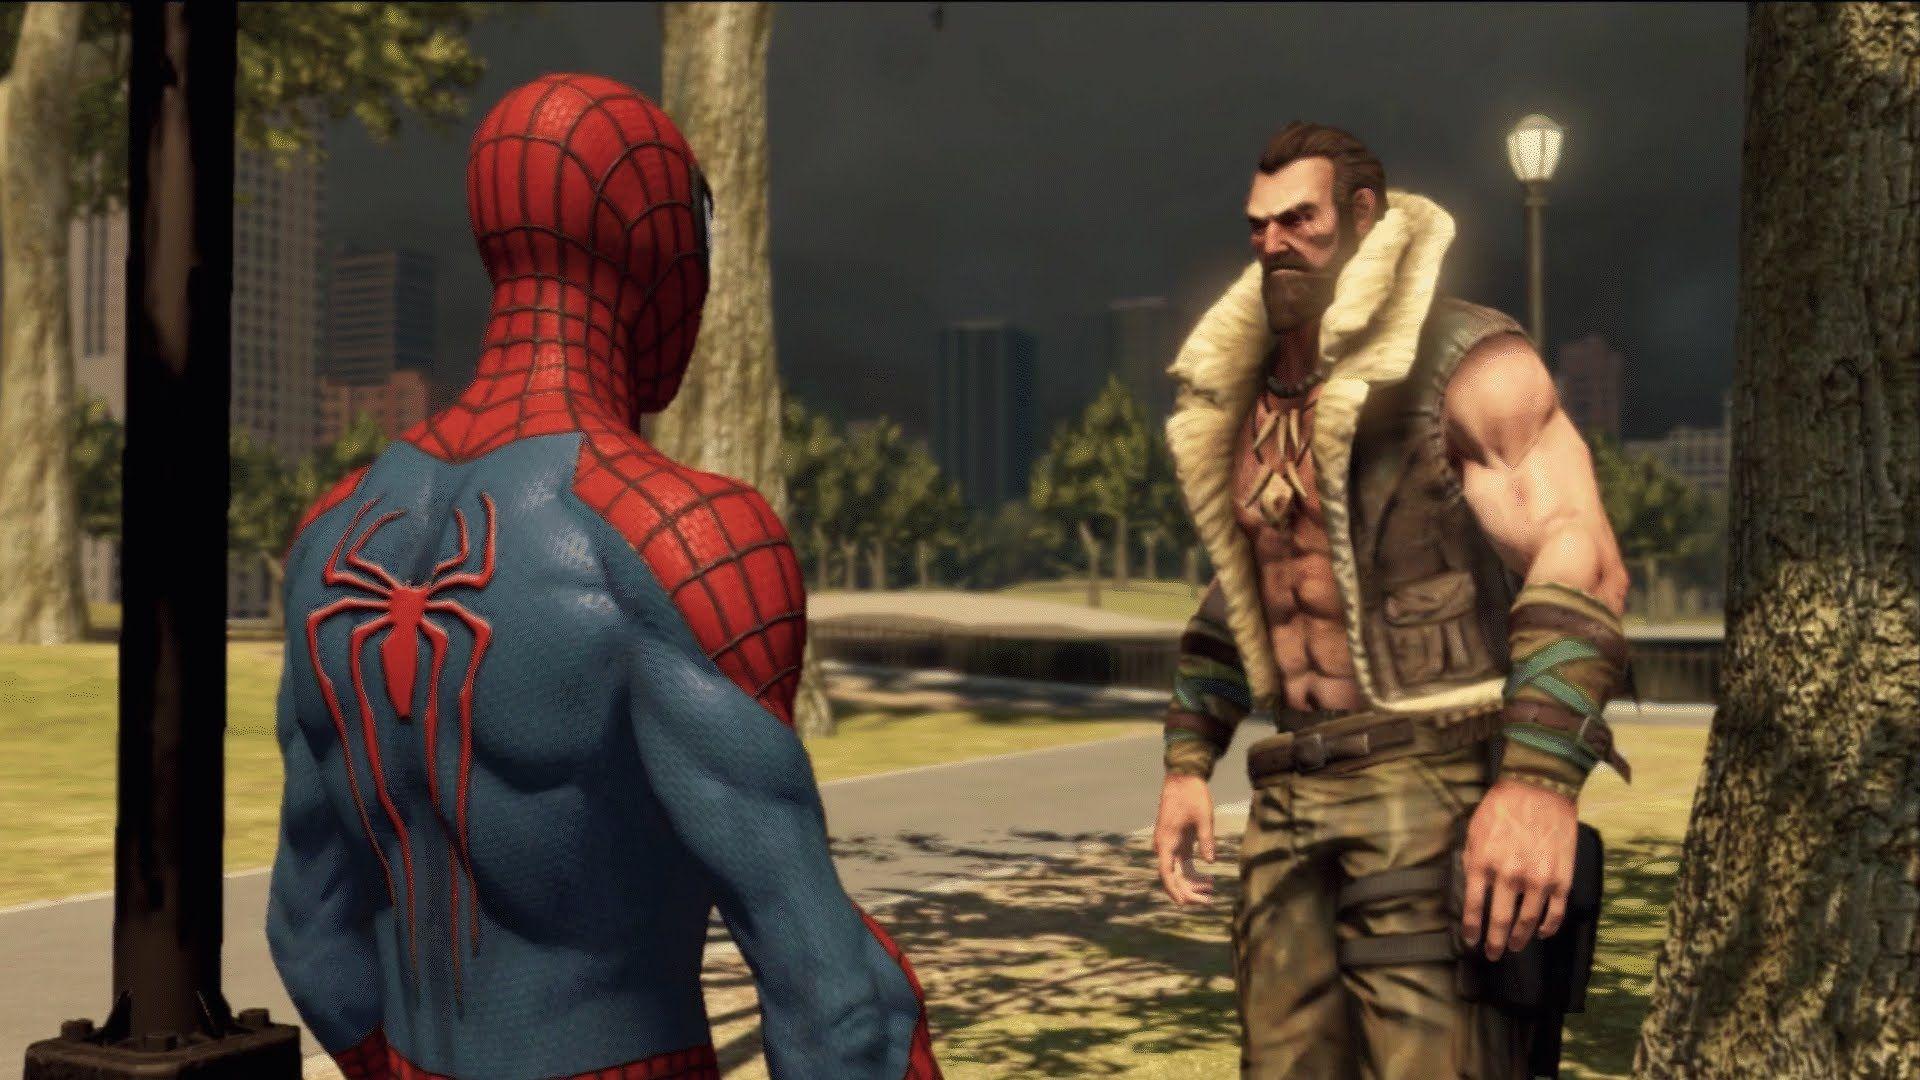 Spiderman VS Kraven the Hunter - The Amazing Spider Man 2